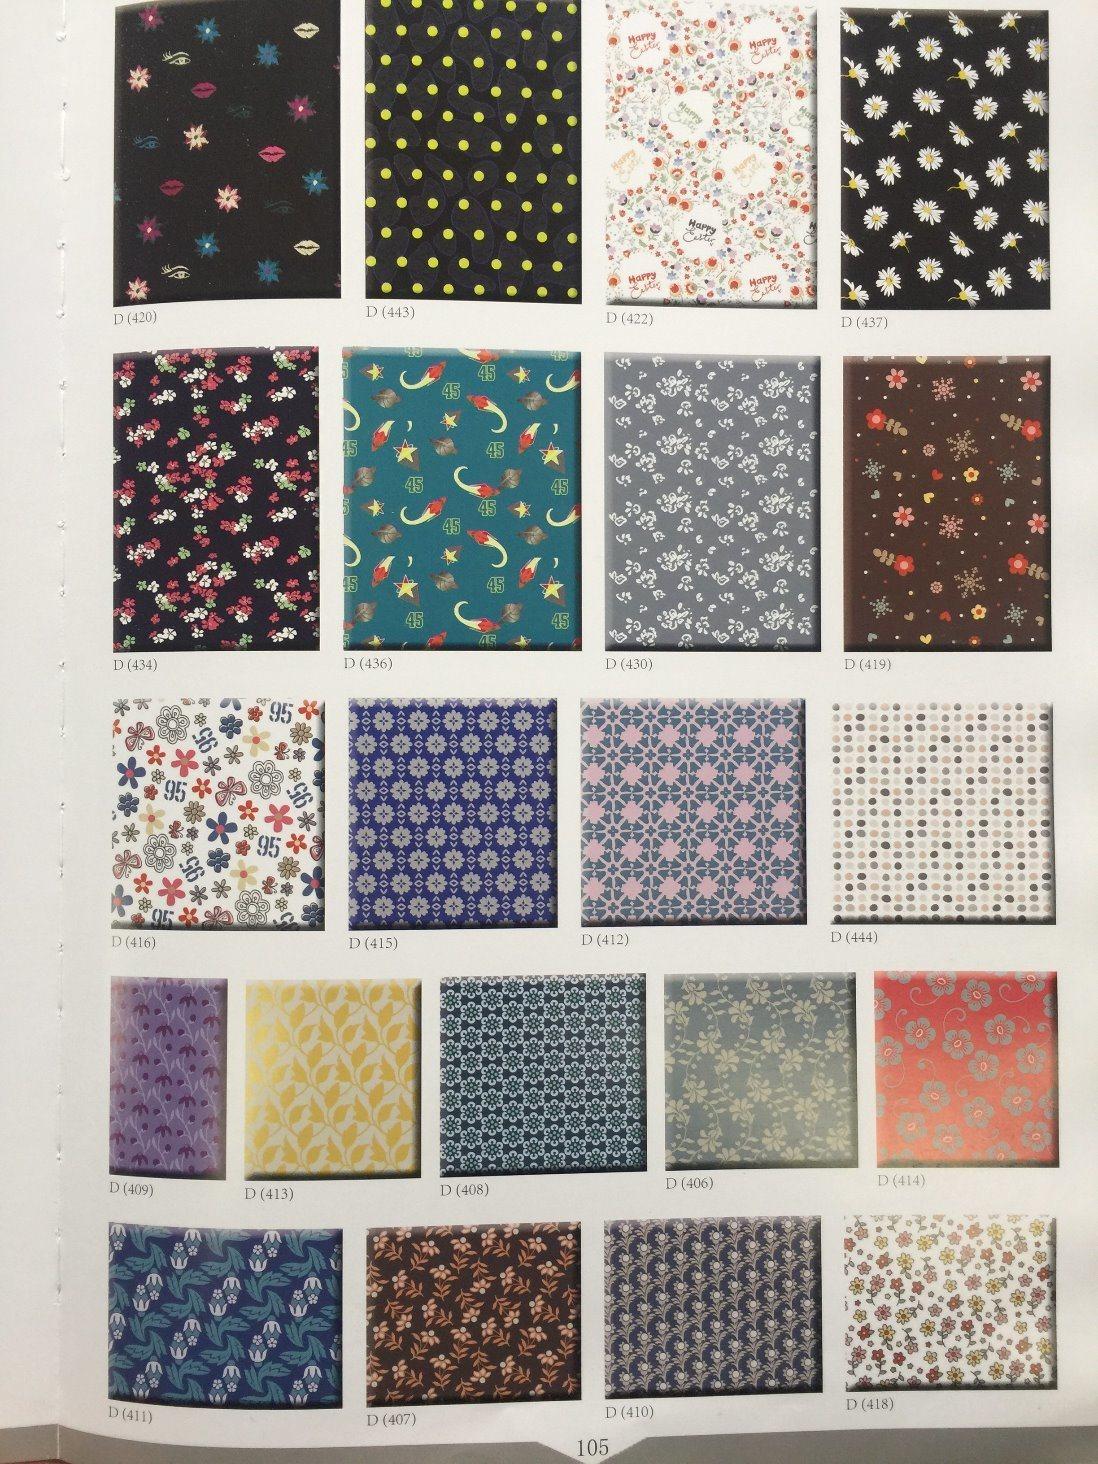 China Different Types of Digital Printing Designs Fabrics